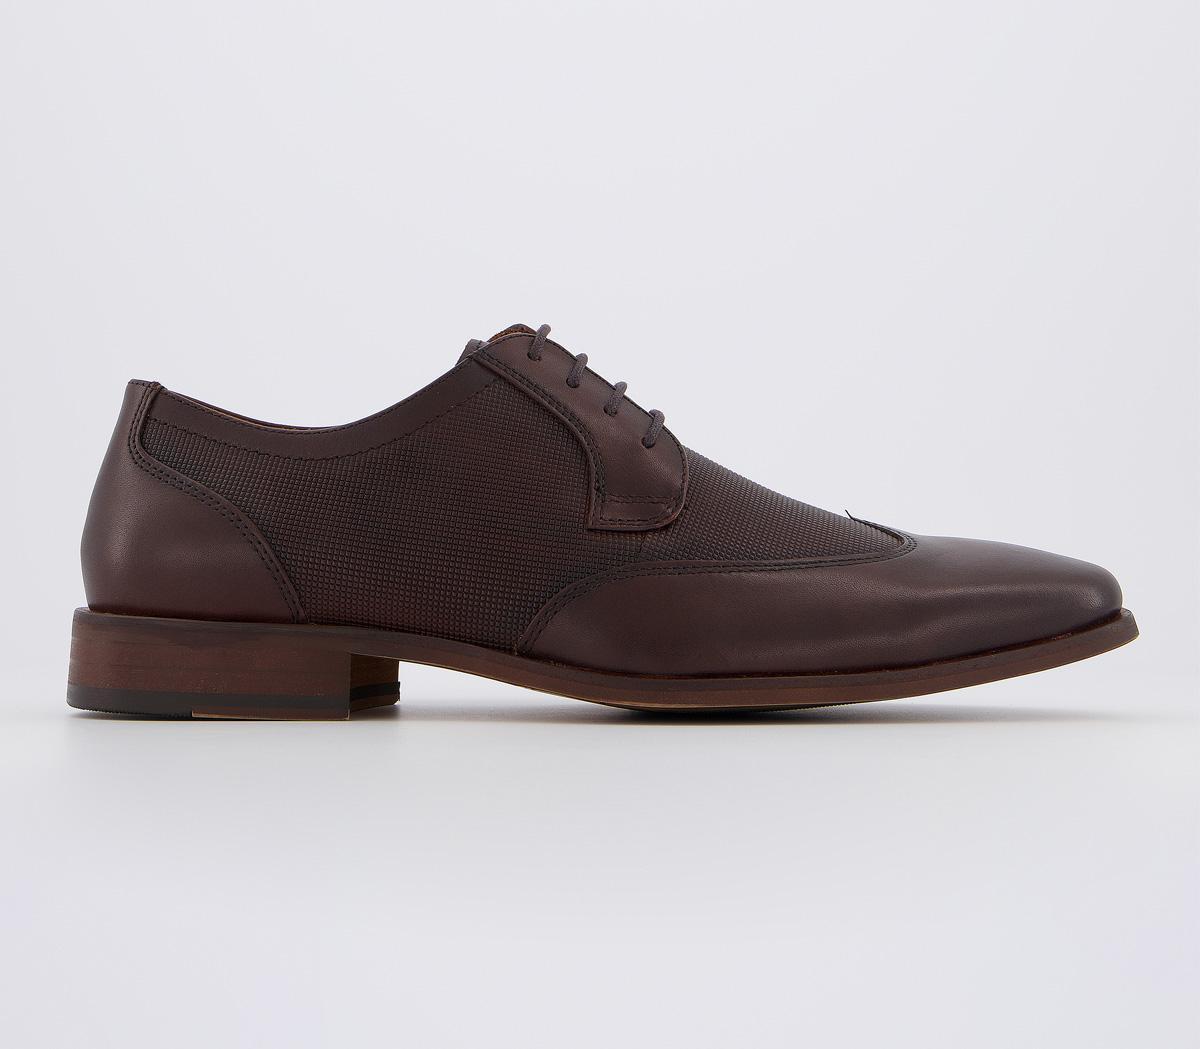 Mike Wingcap Derby Shoes